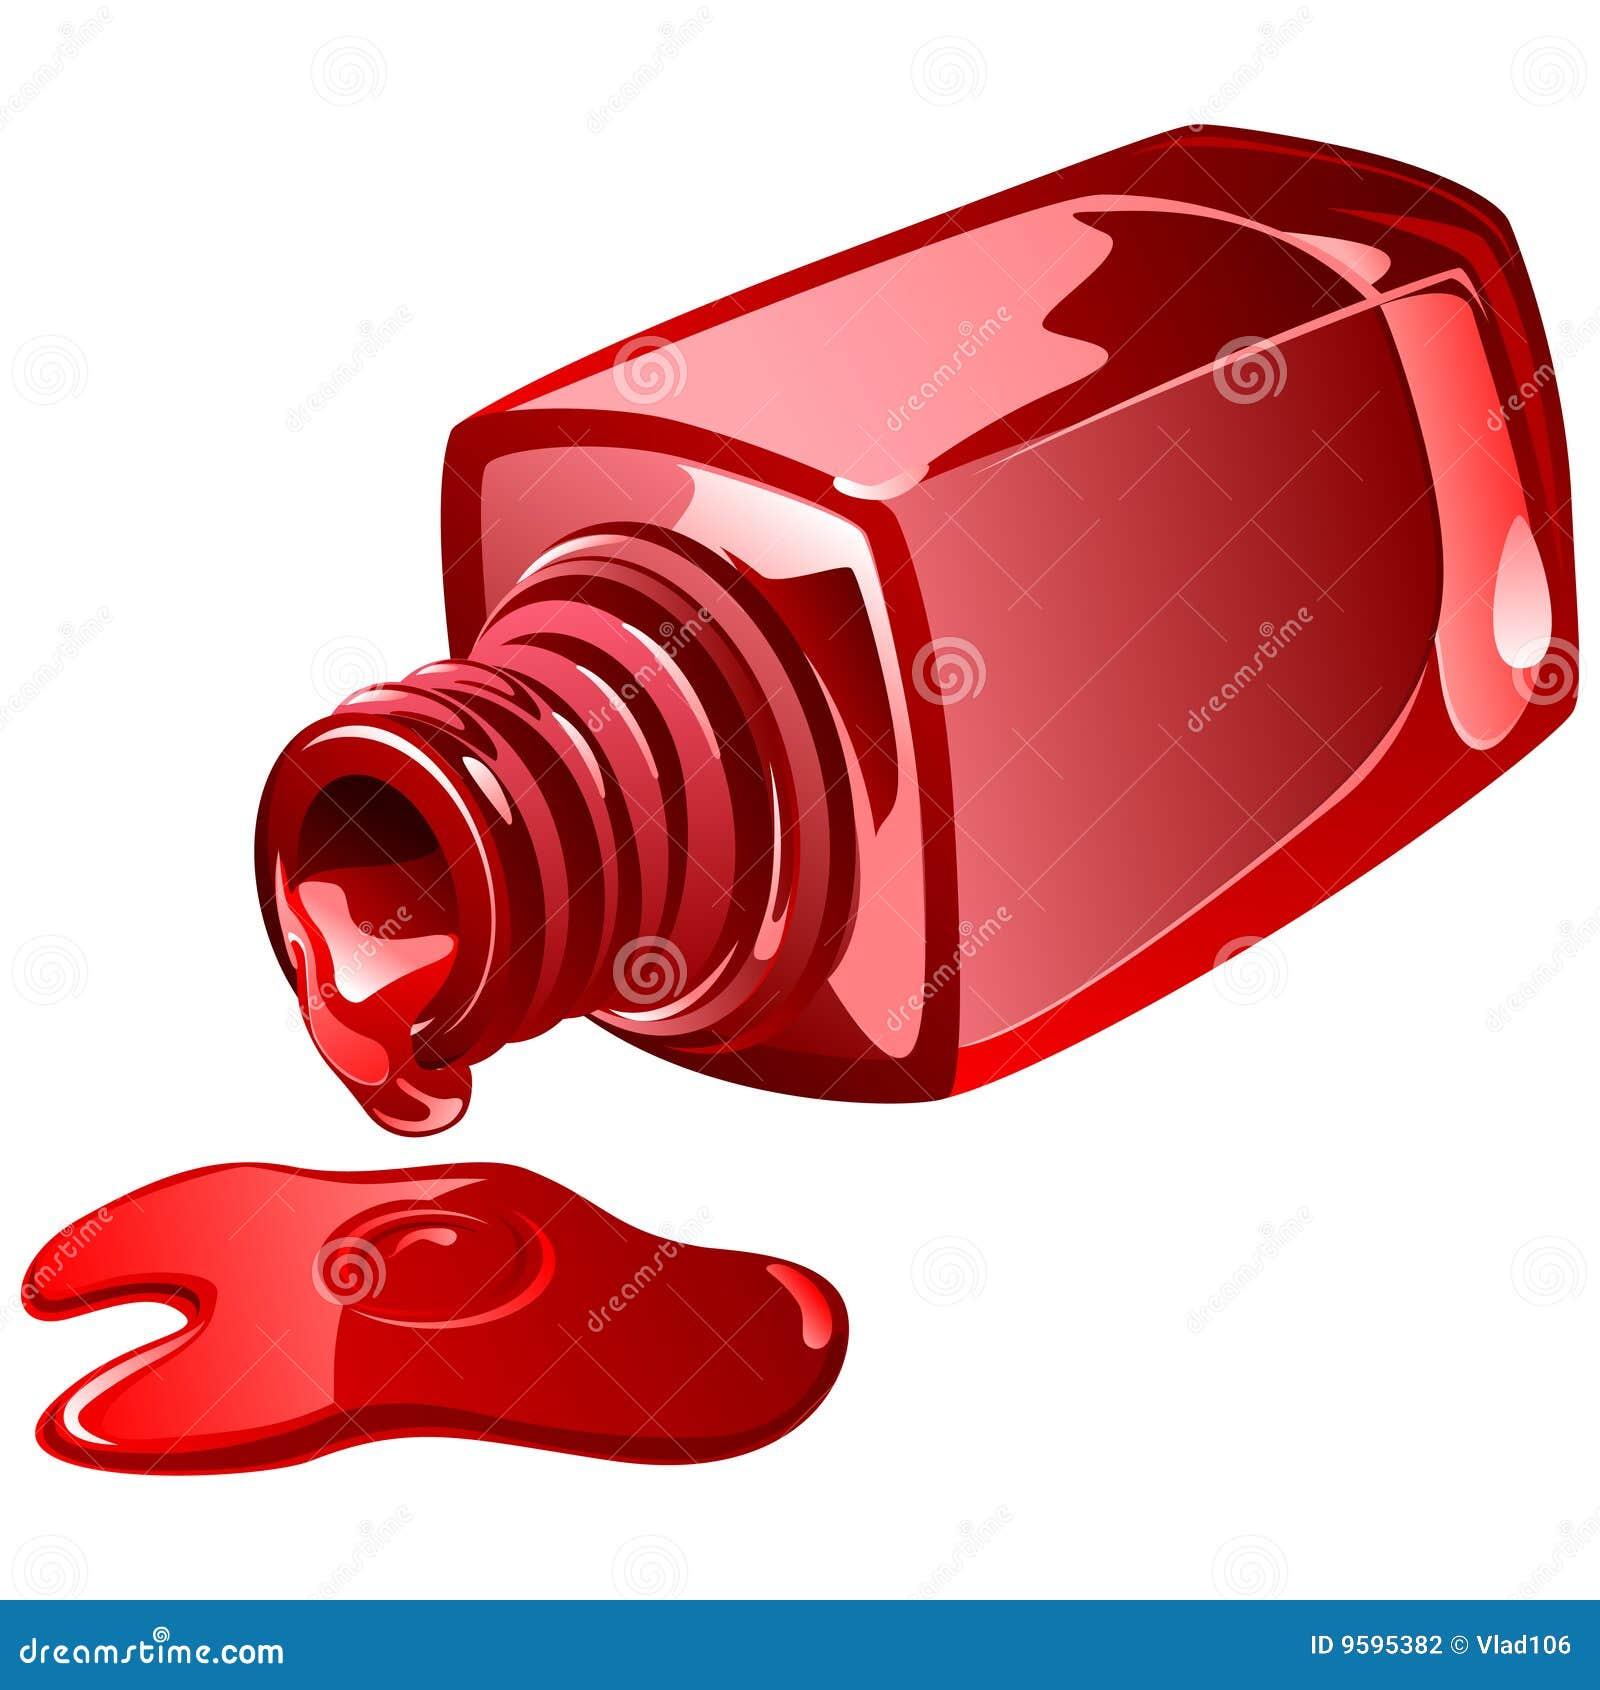 Free Fingernail Art Cliparts Download Free Clip Art Free: Nail Polish. Stock Vector. Image Of Color, Closeup, Icon